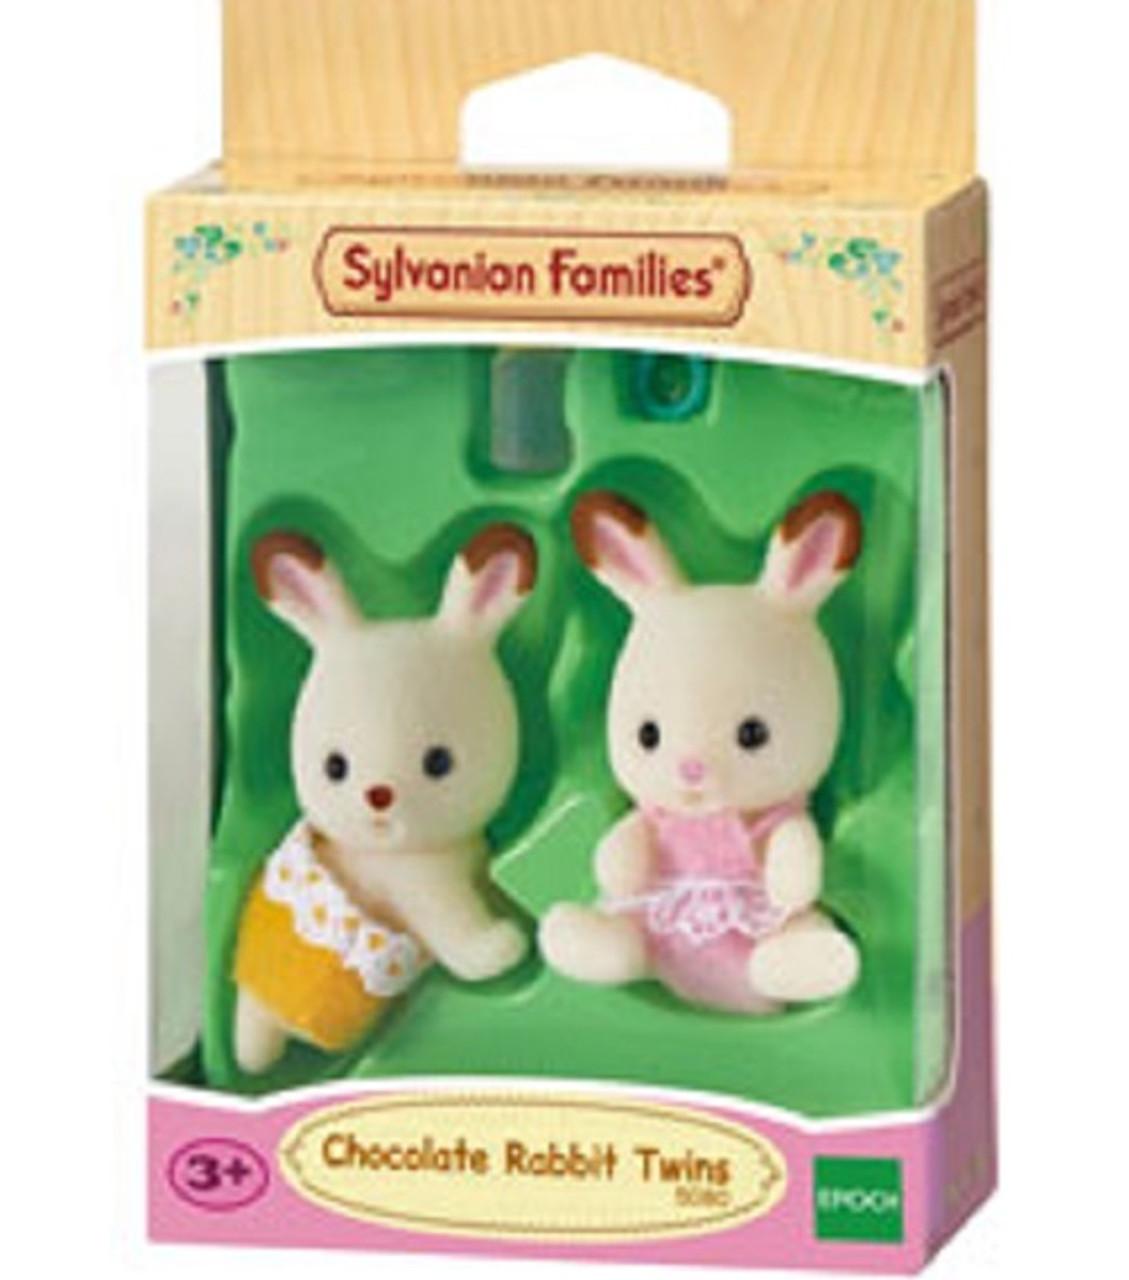 Twins of Sylvanian Families dolls milk rabbit family milk rabbit